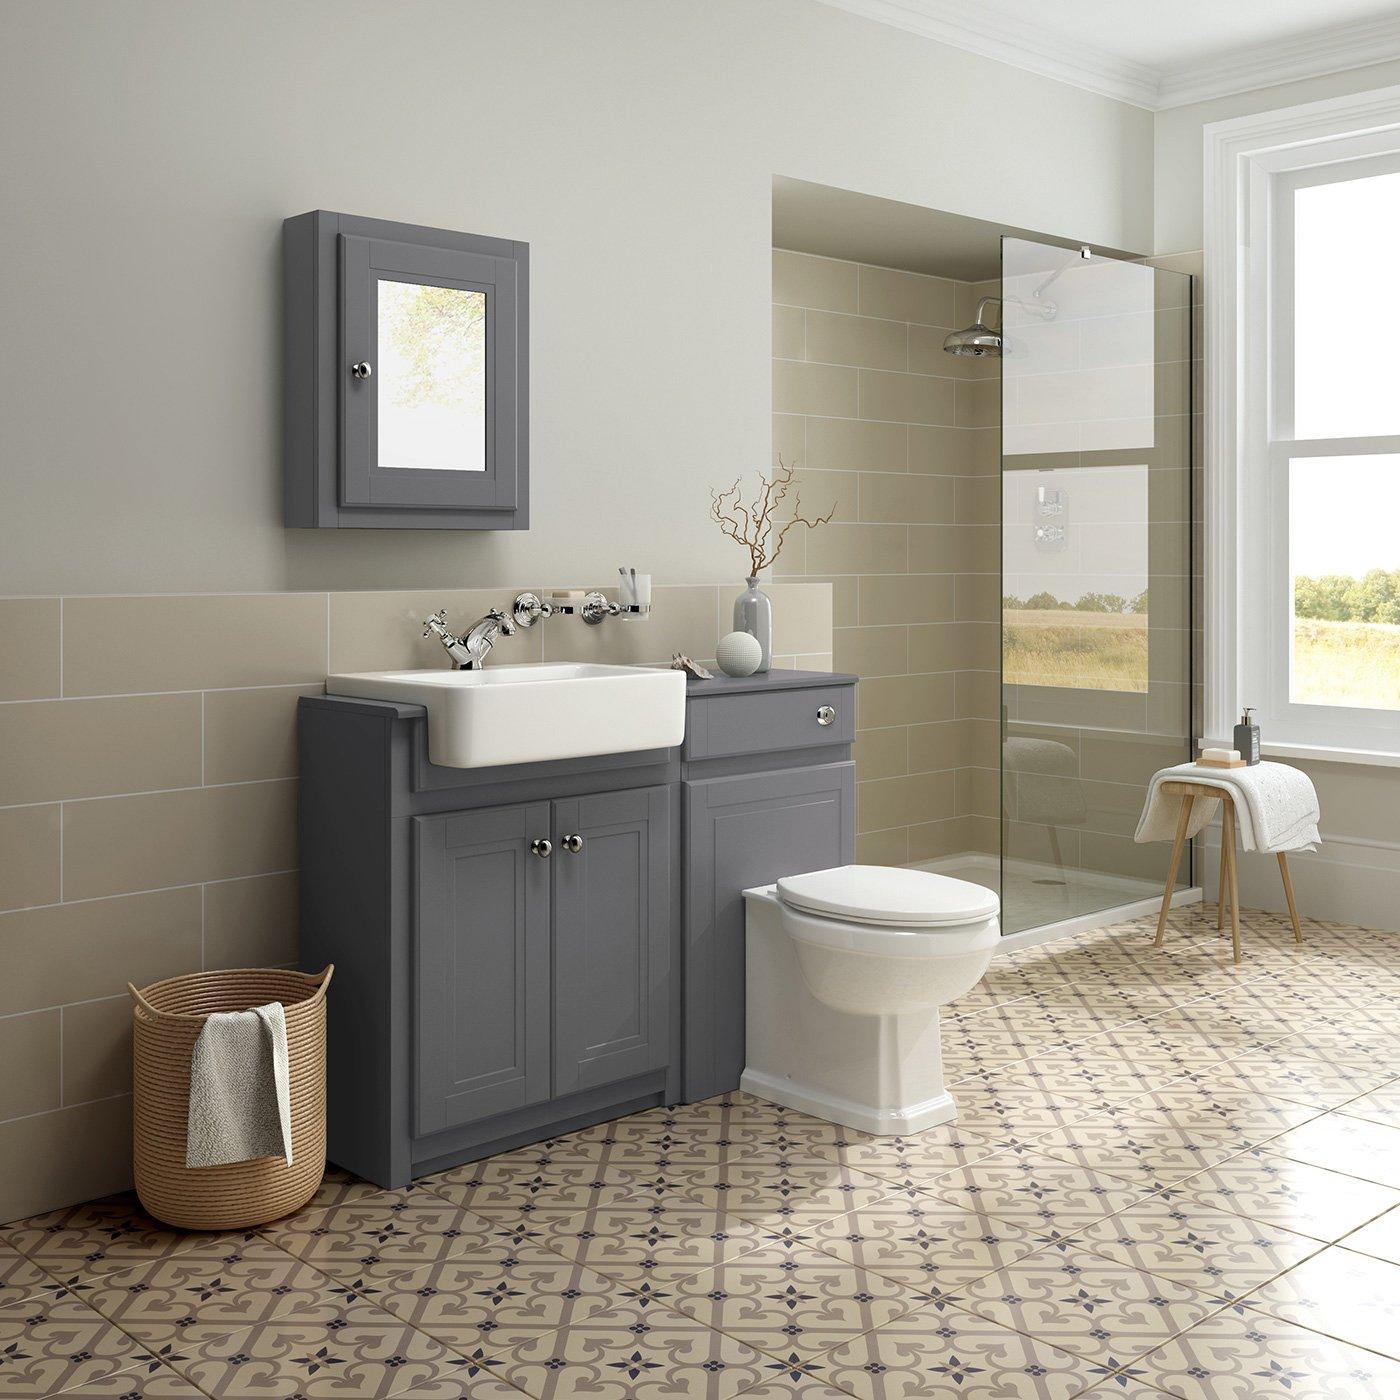 1100mmbined Vanity Unit Toilet Basin Grey Bathroom Furniture Storage  Sink: Ibathuk: Amazon: Kitchen & Home